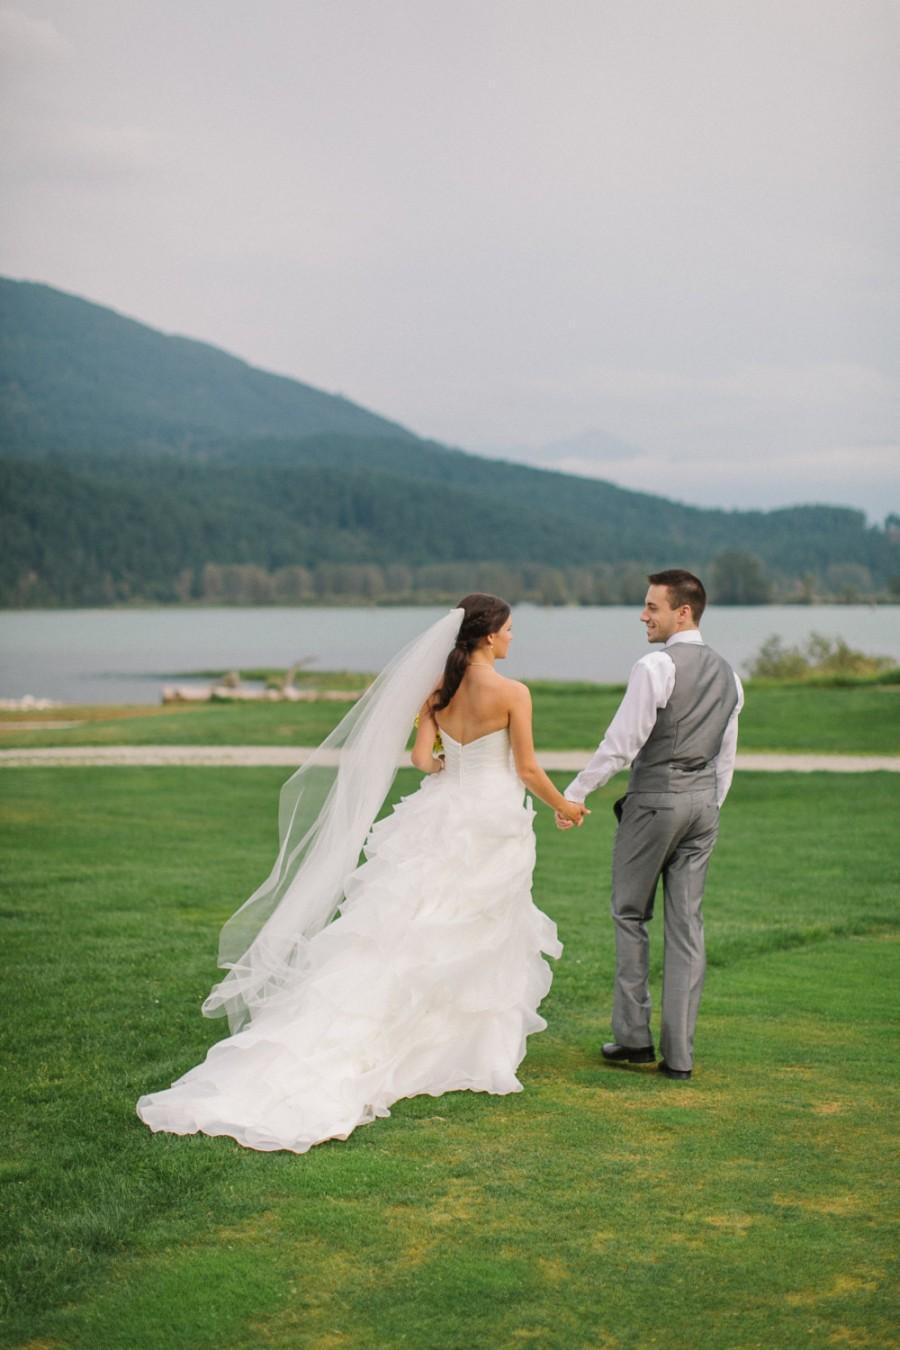 Свадьба - 75 inch single tier classic, sheer, plain and simple, elegant chapel veil, floor length veil, waltz, wedding veil, bridal veil light ivory